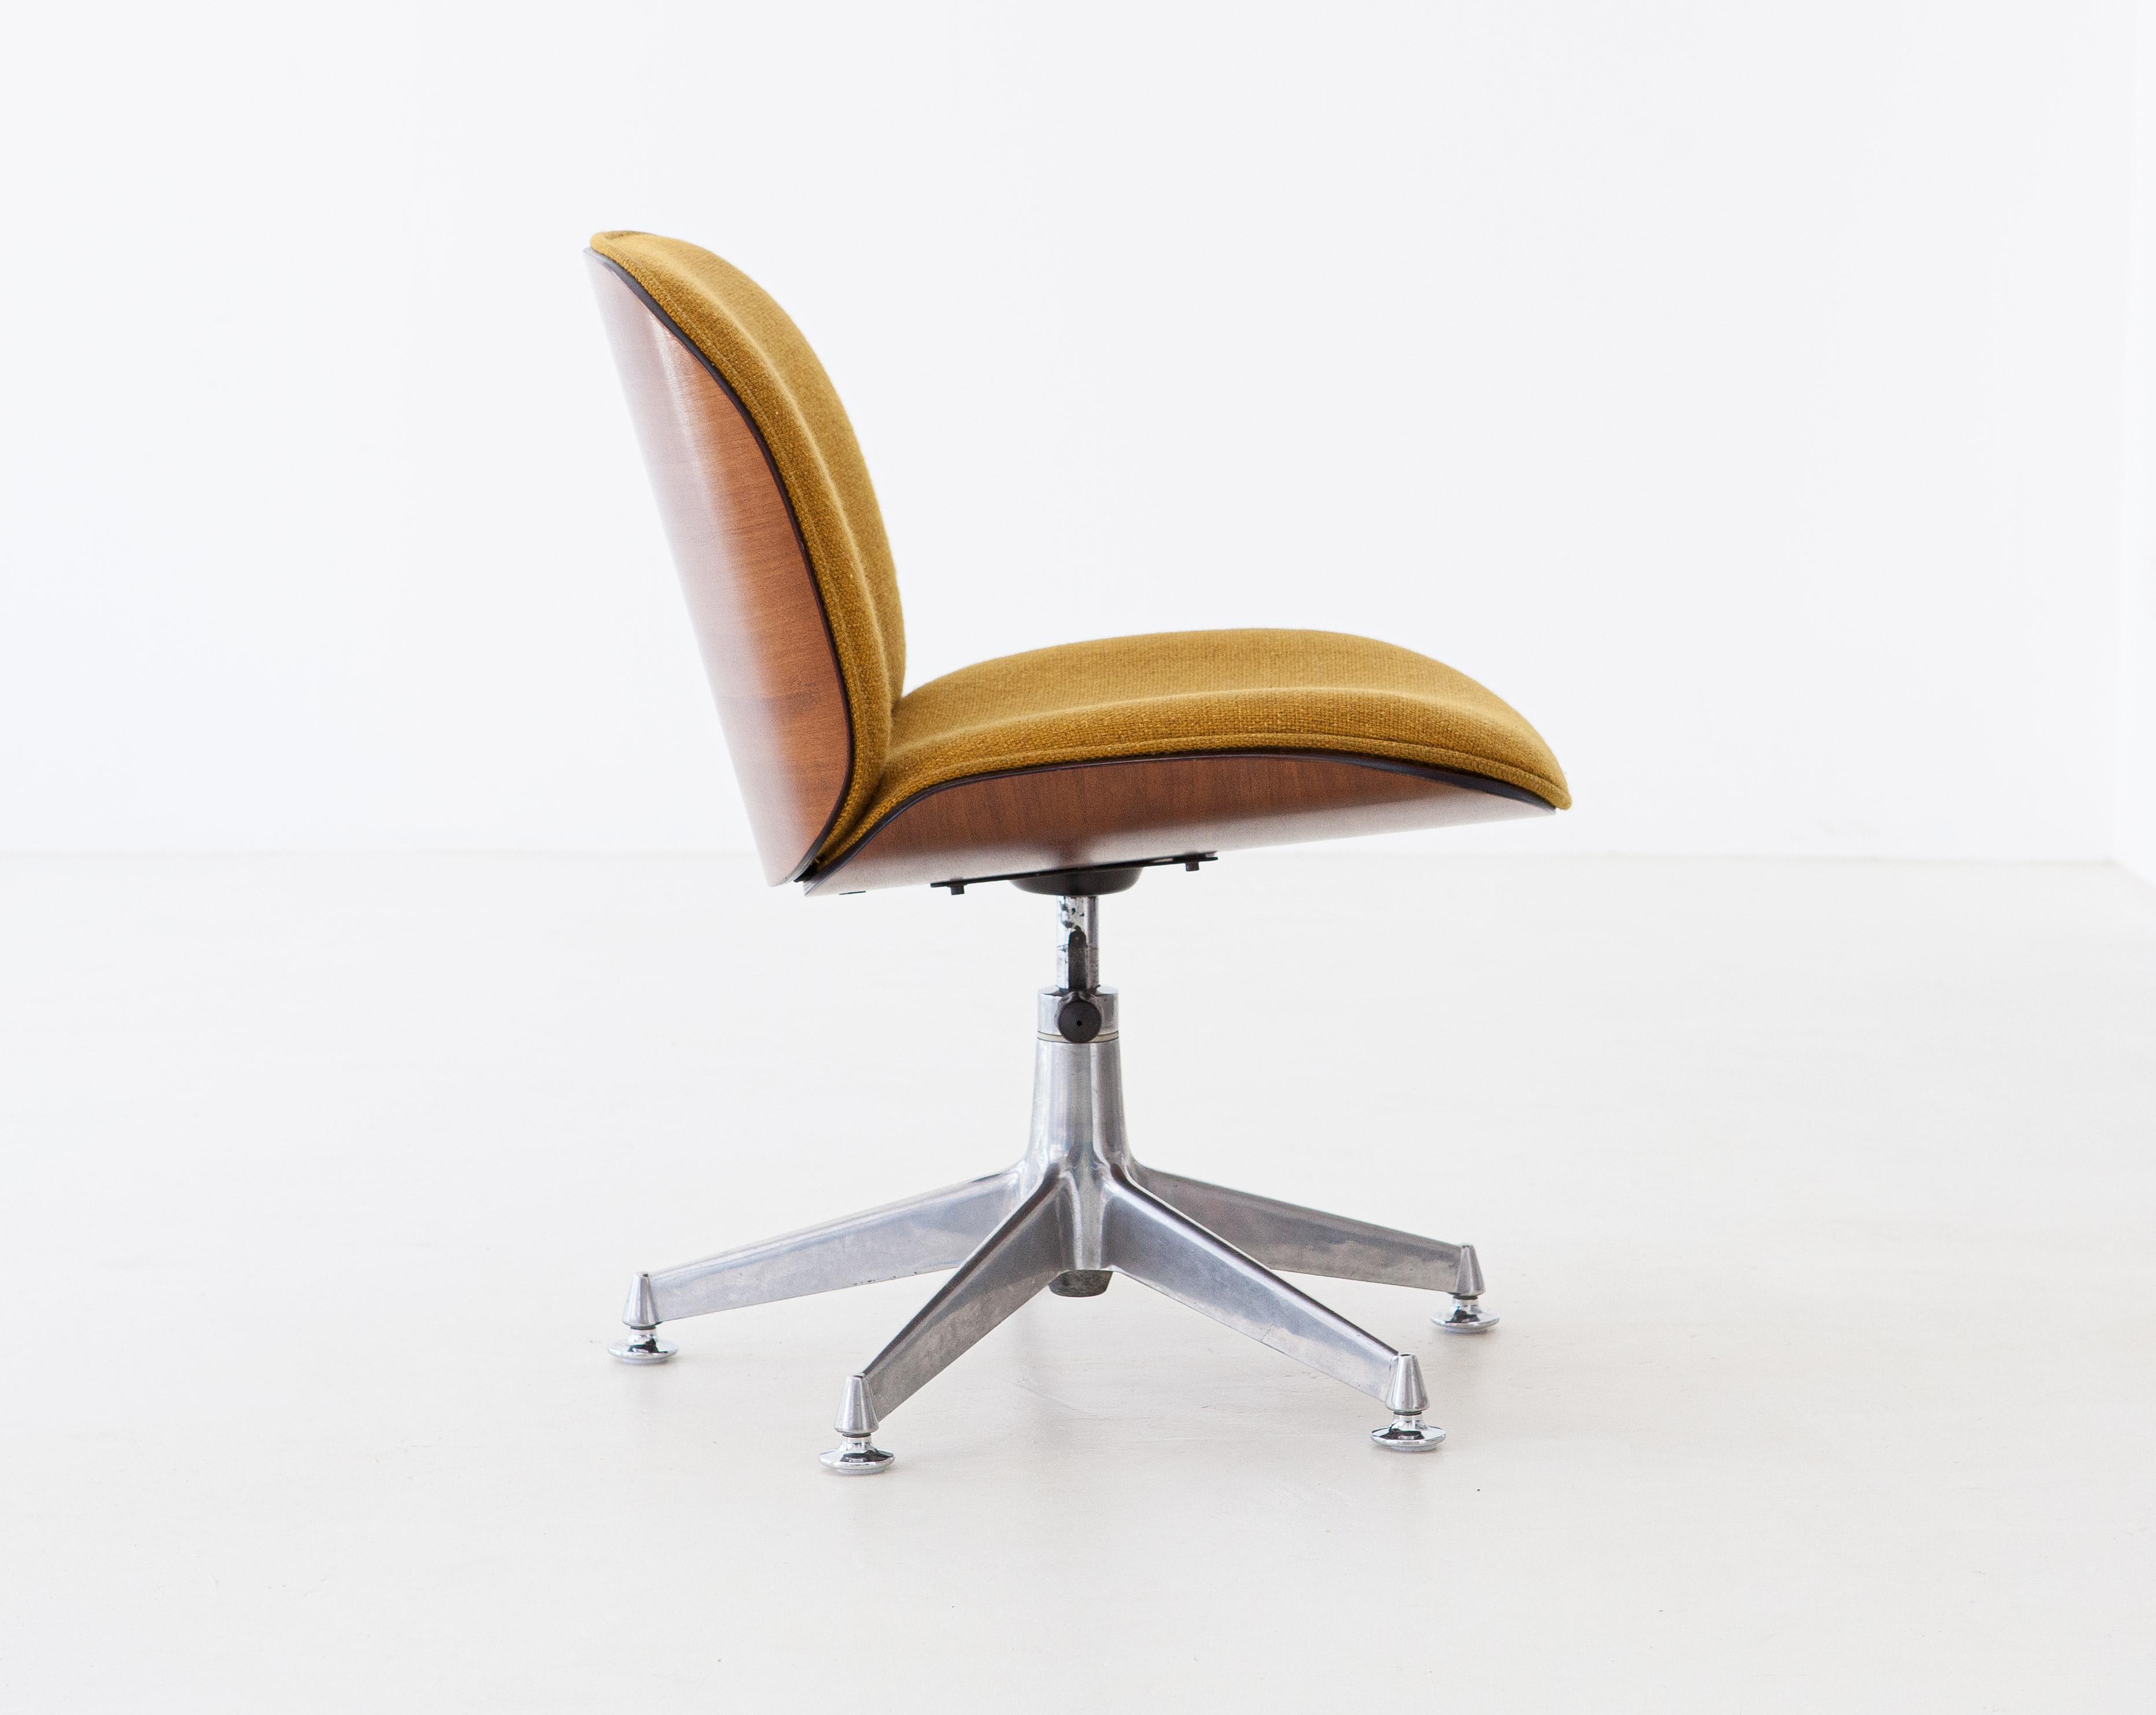 1950s-ico-parisi-for-mim-walnut-swivel-desk-chairs-10-se305